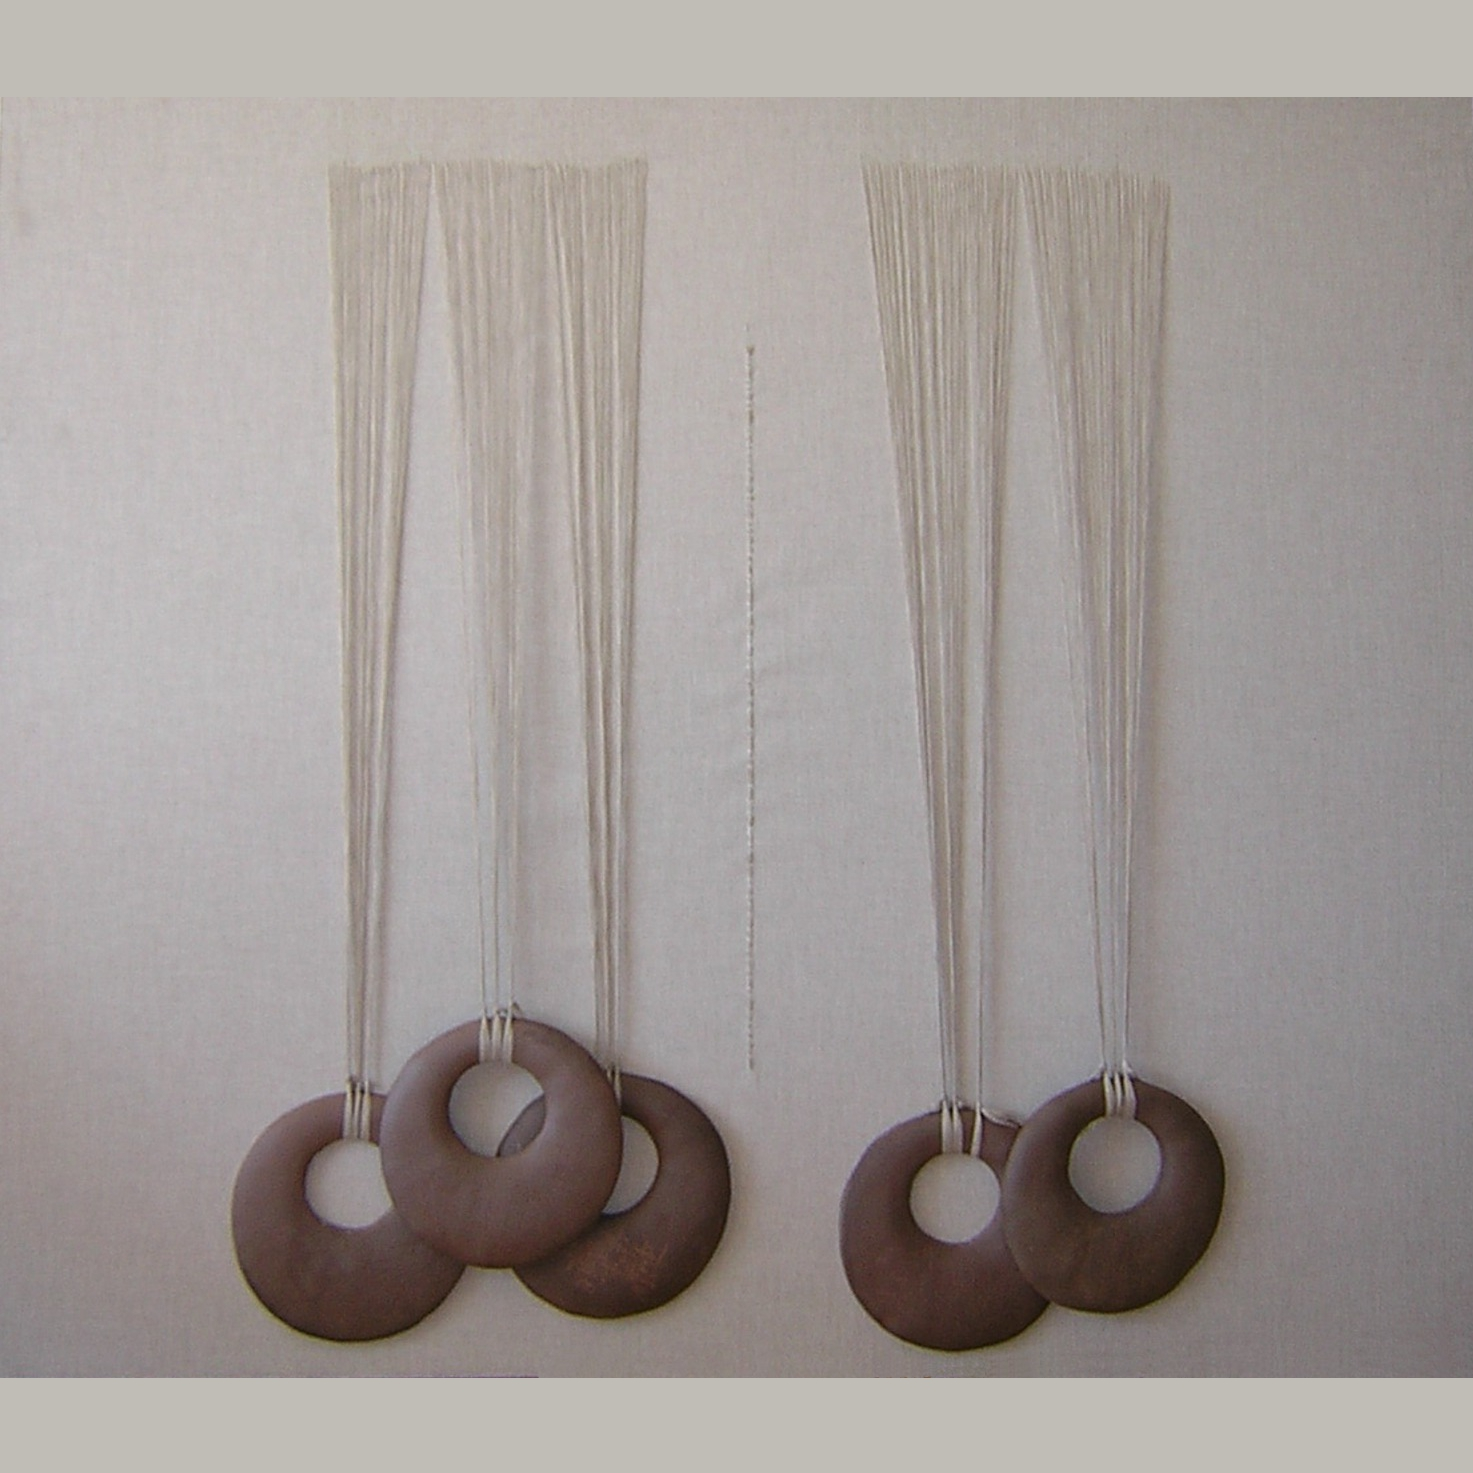 tela-trama-urdimbre-sutura-2